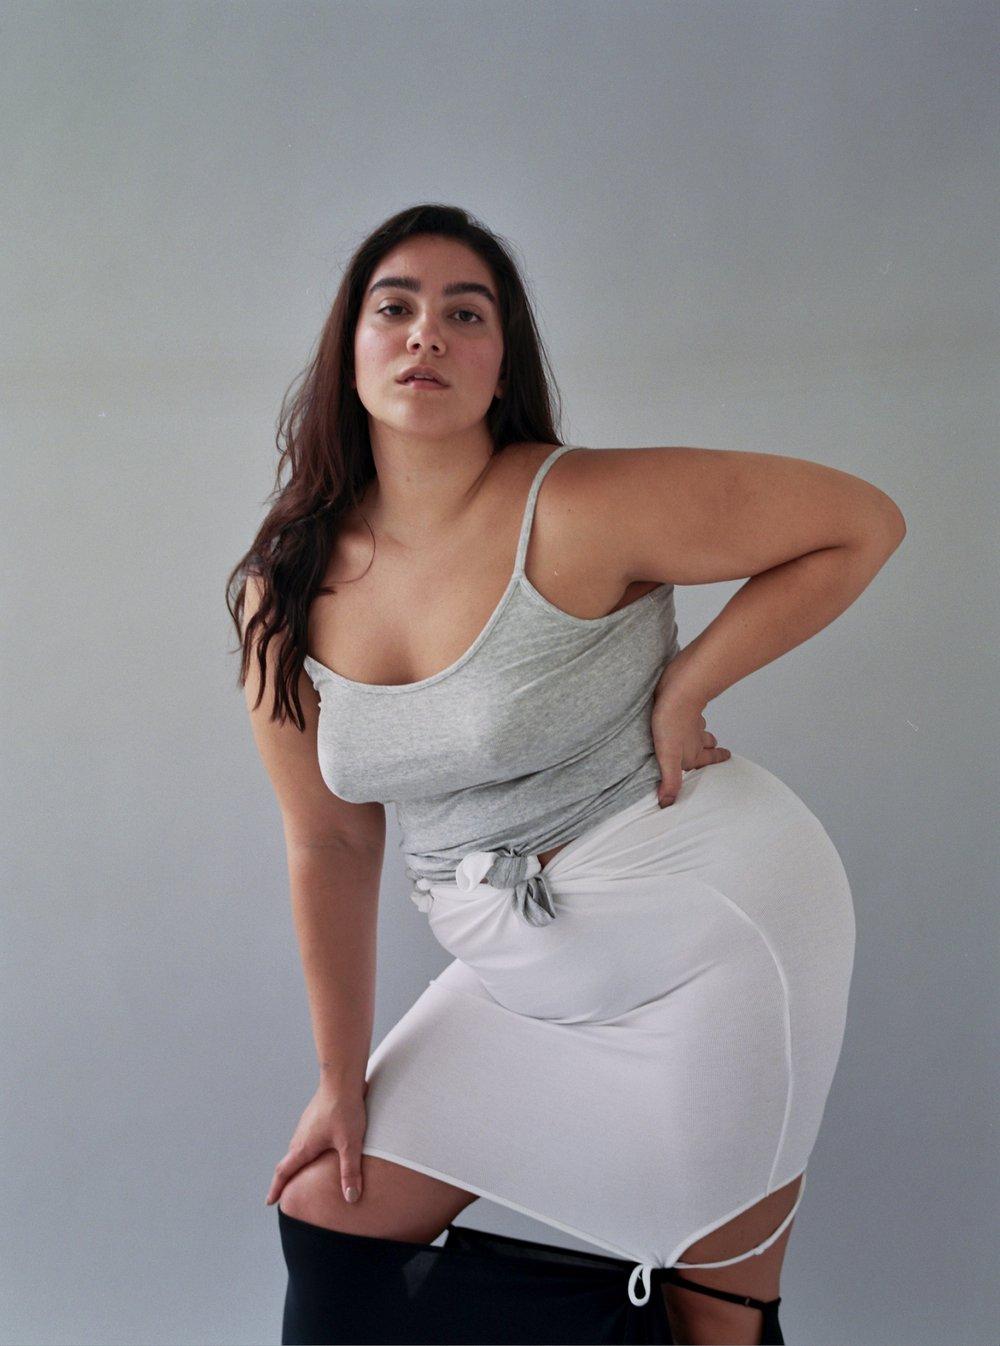 Nadia 2-16.jpg